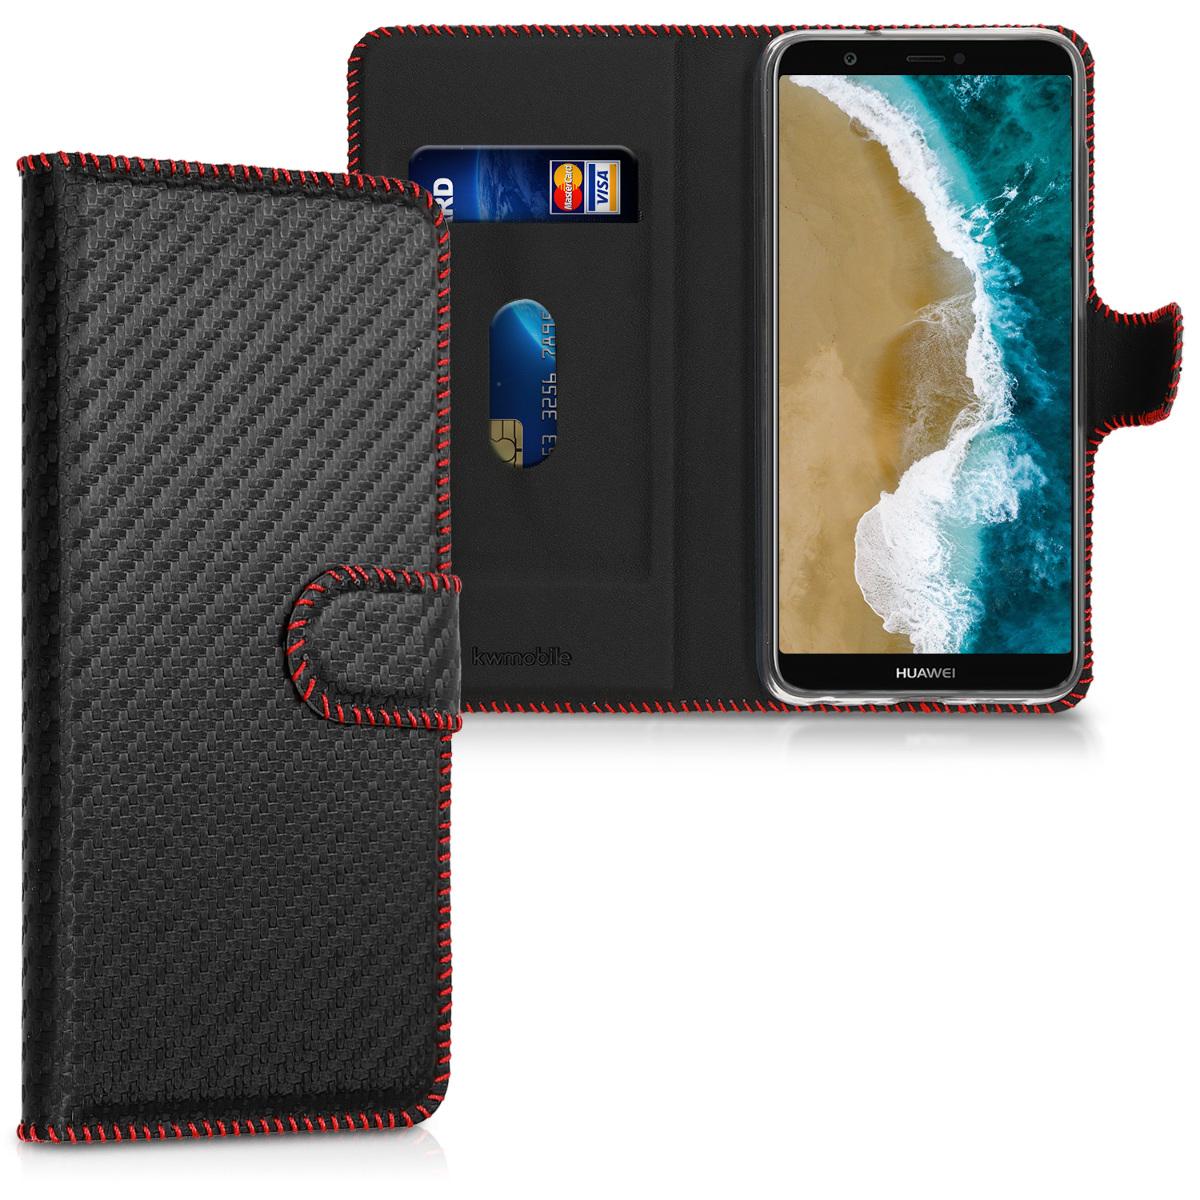 KW Θήκη - Πορτοφόλι Huawei P Smart 2018 - Carbon Black / Red (44693.04)